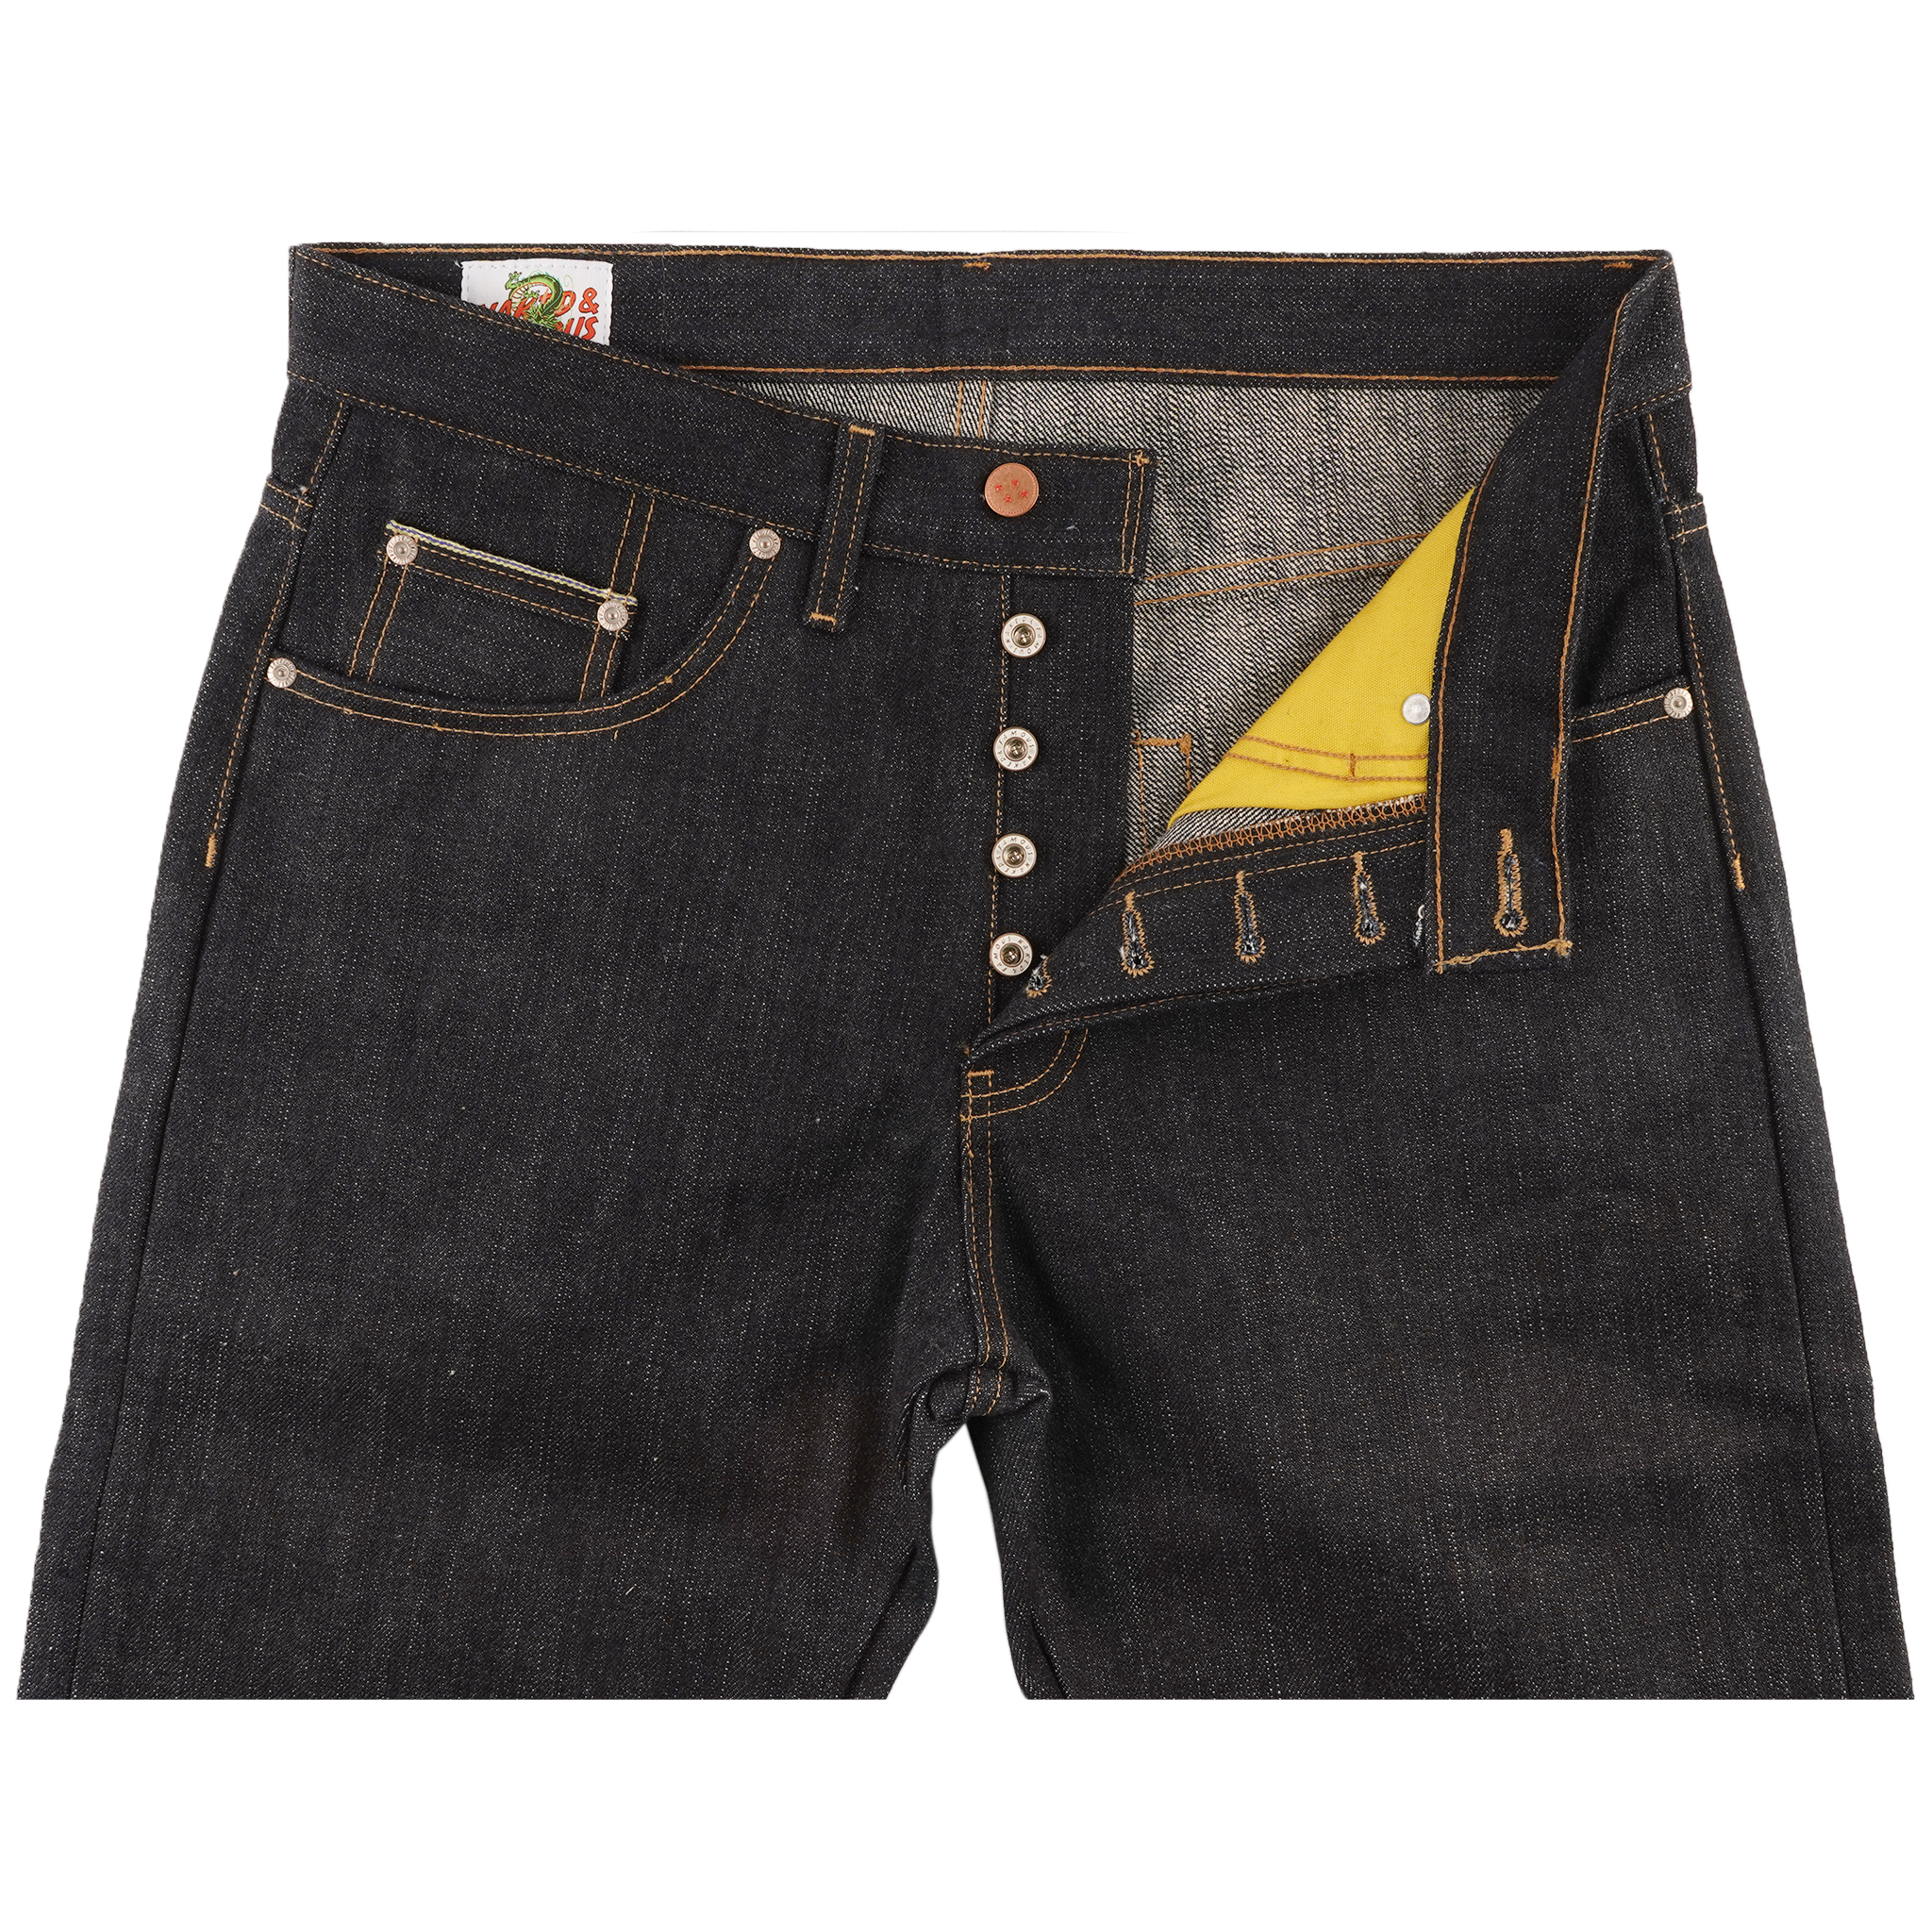 Vegeta Super Saiyan Selvedge Jeans front view